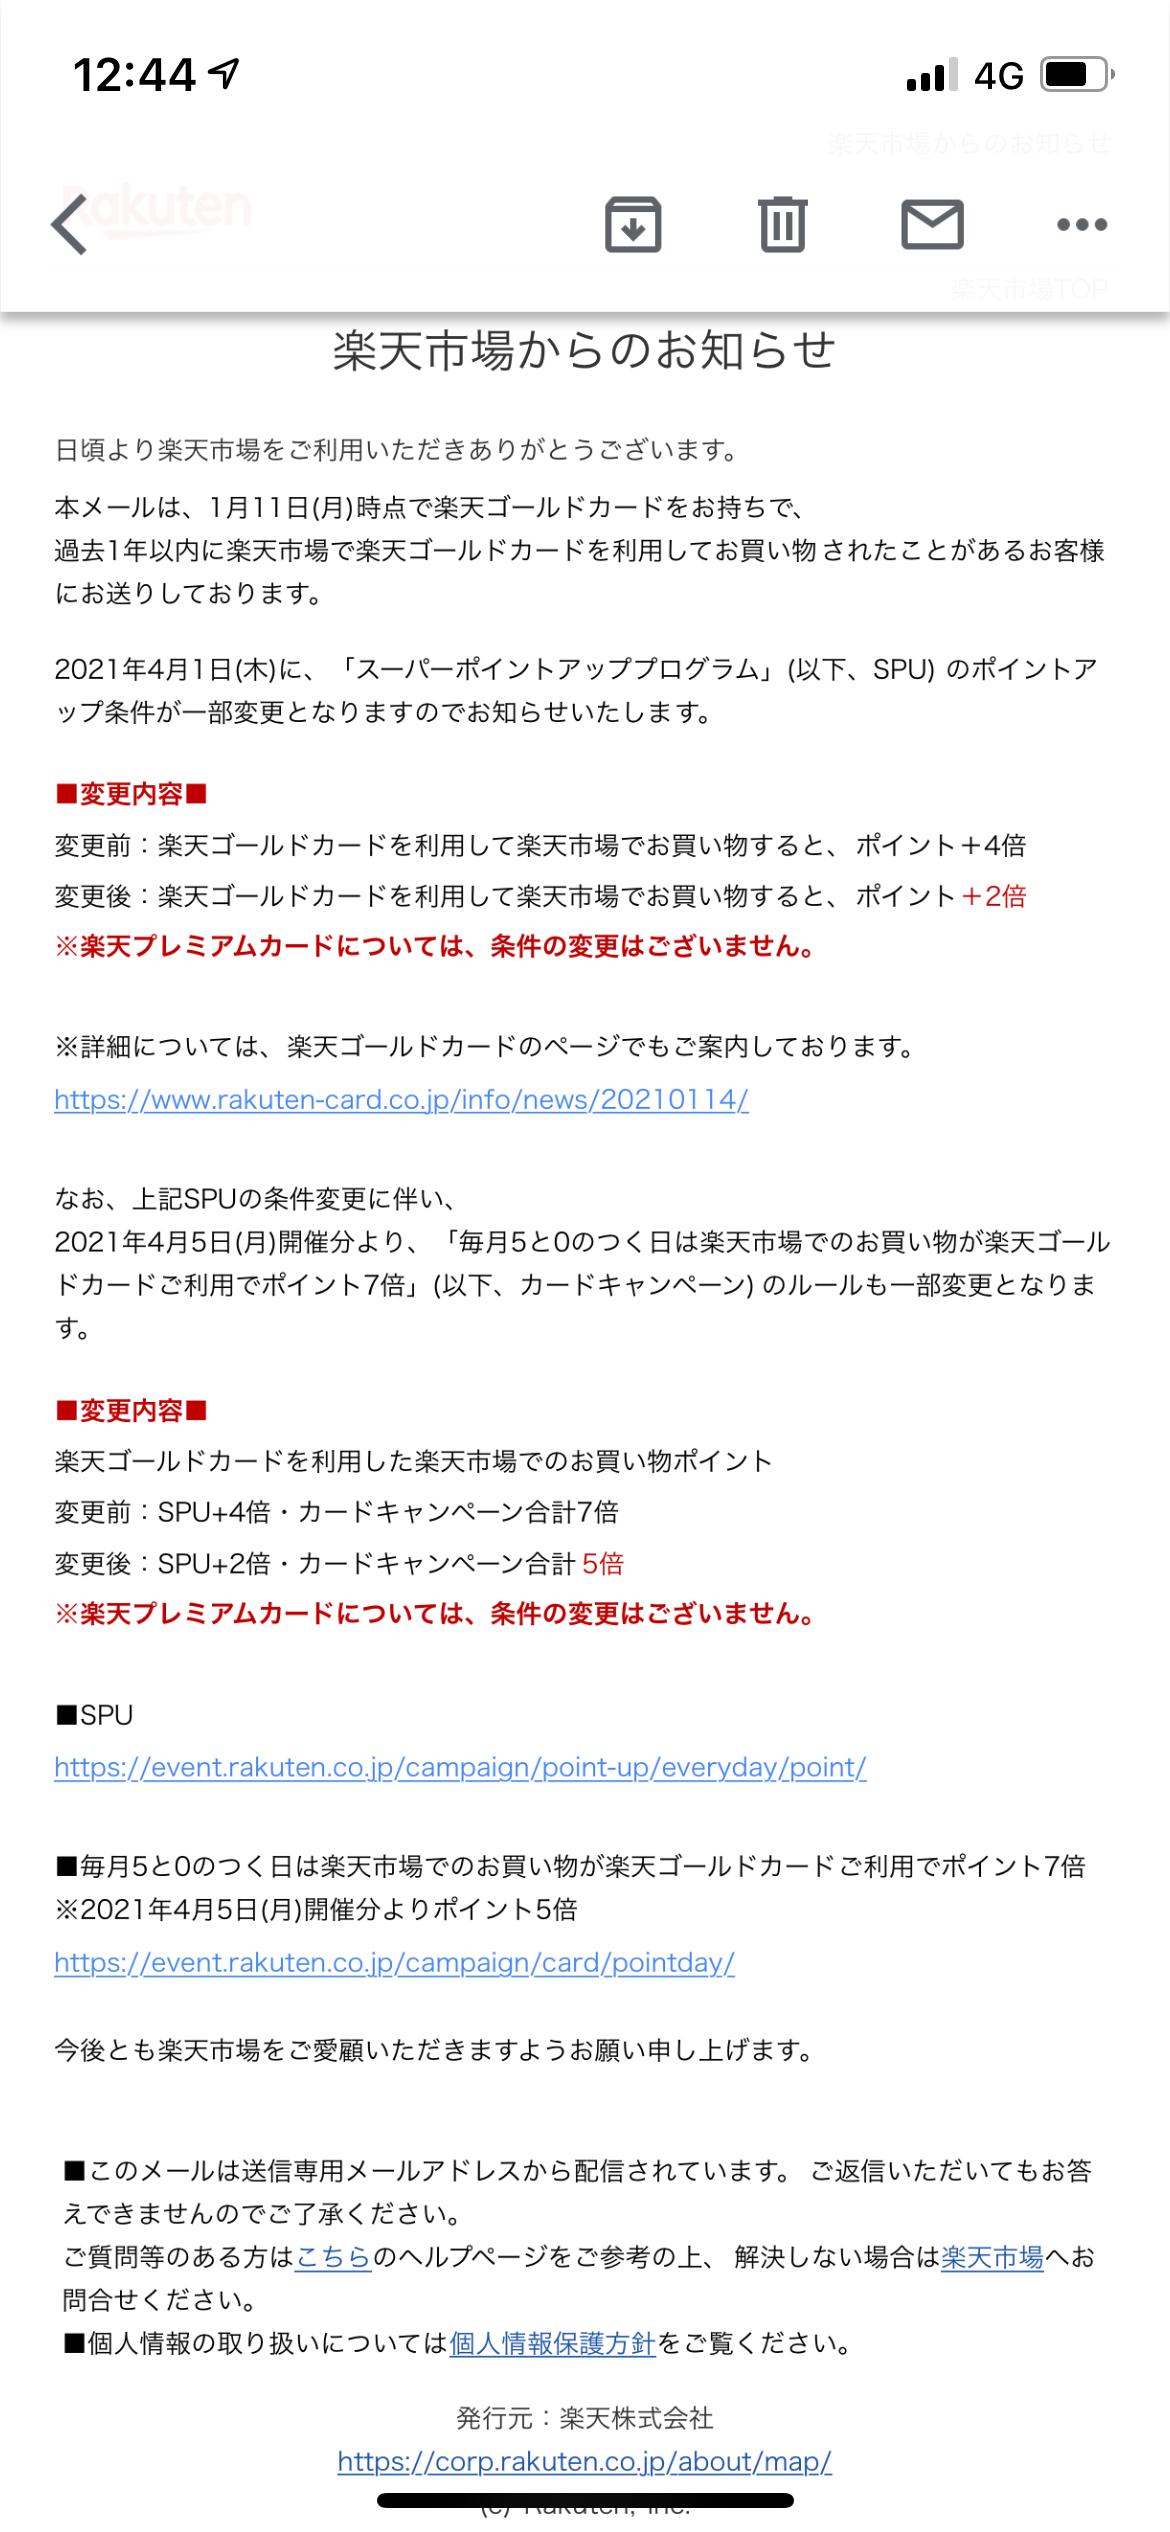 f:id:salarymanceo:20210116144747p:image